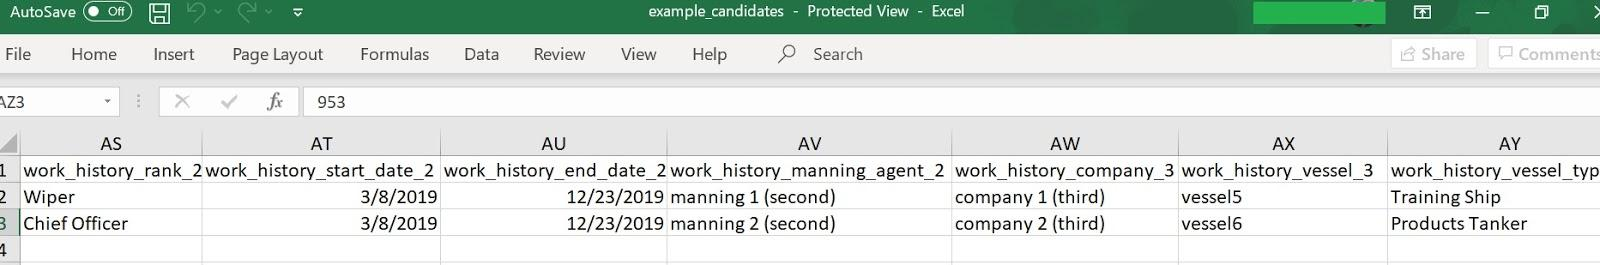 screenshot of the sample Excel spreadsheet